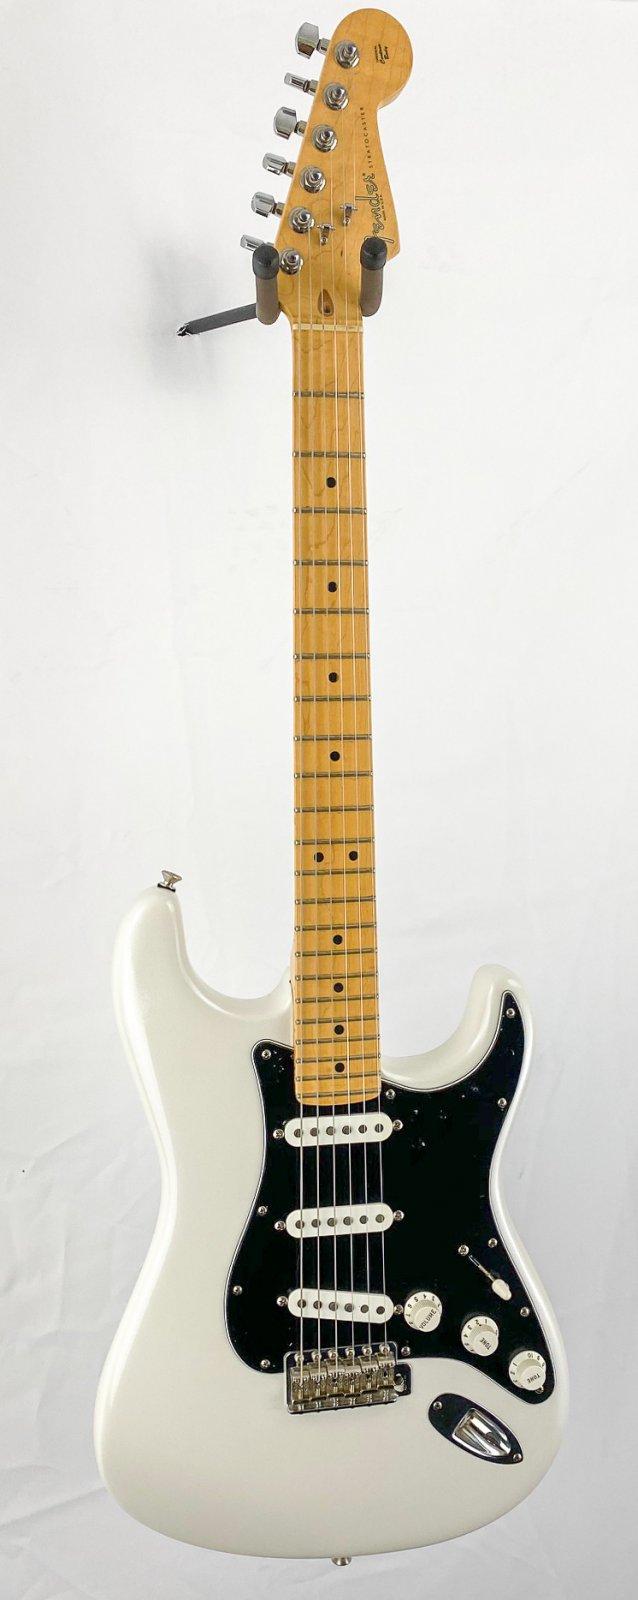 2002 Fender American Standard Strat - Pearl White refinish